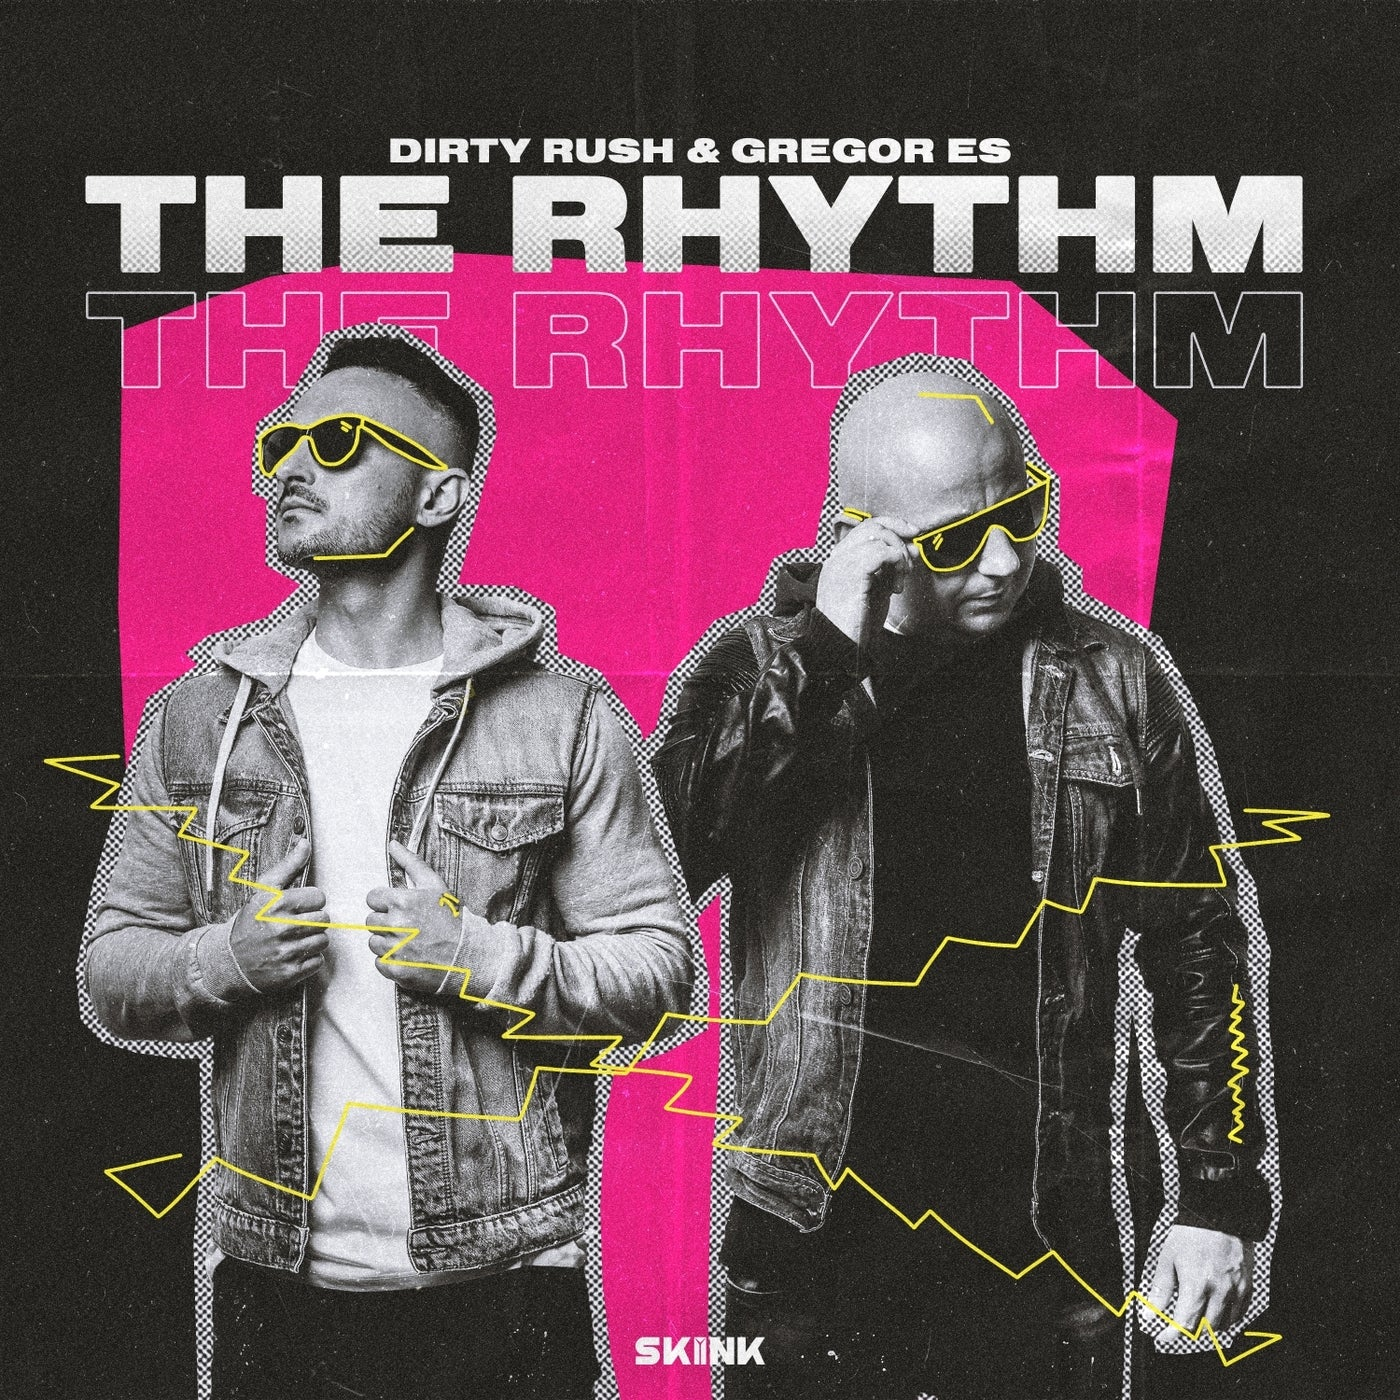 The Rhythm (Extended Mix)